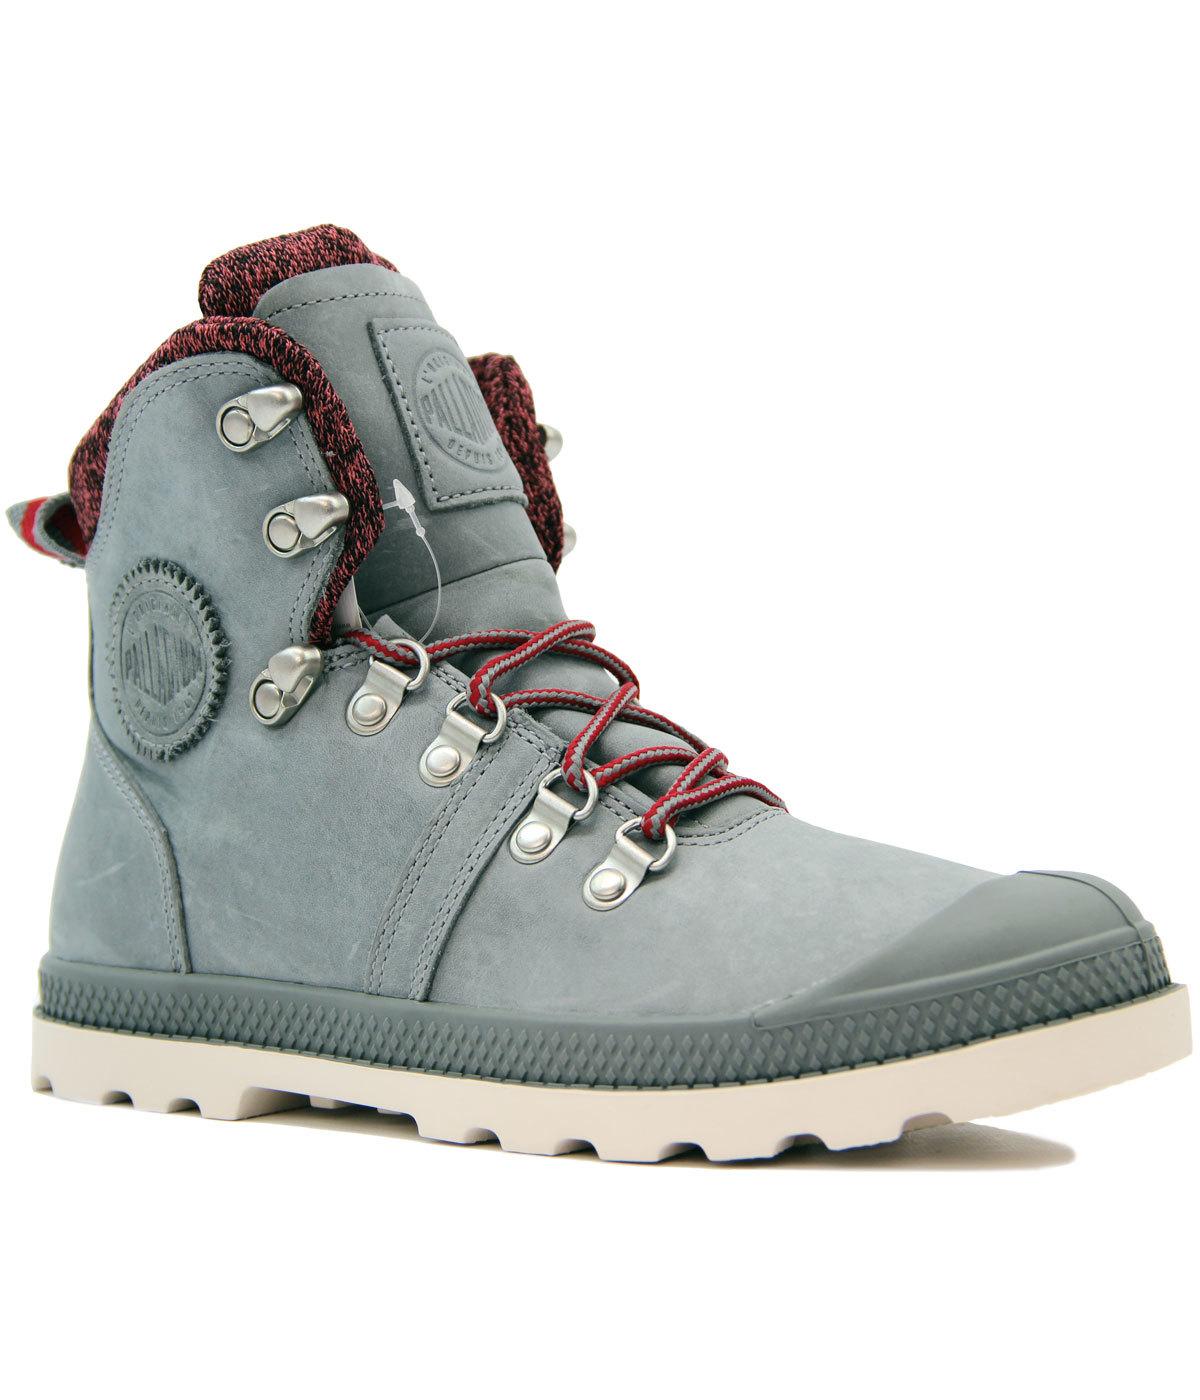 Luxury Amazoncom Palladium Women39s Pallabrouse Baggy Chukka Boot Shoes